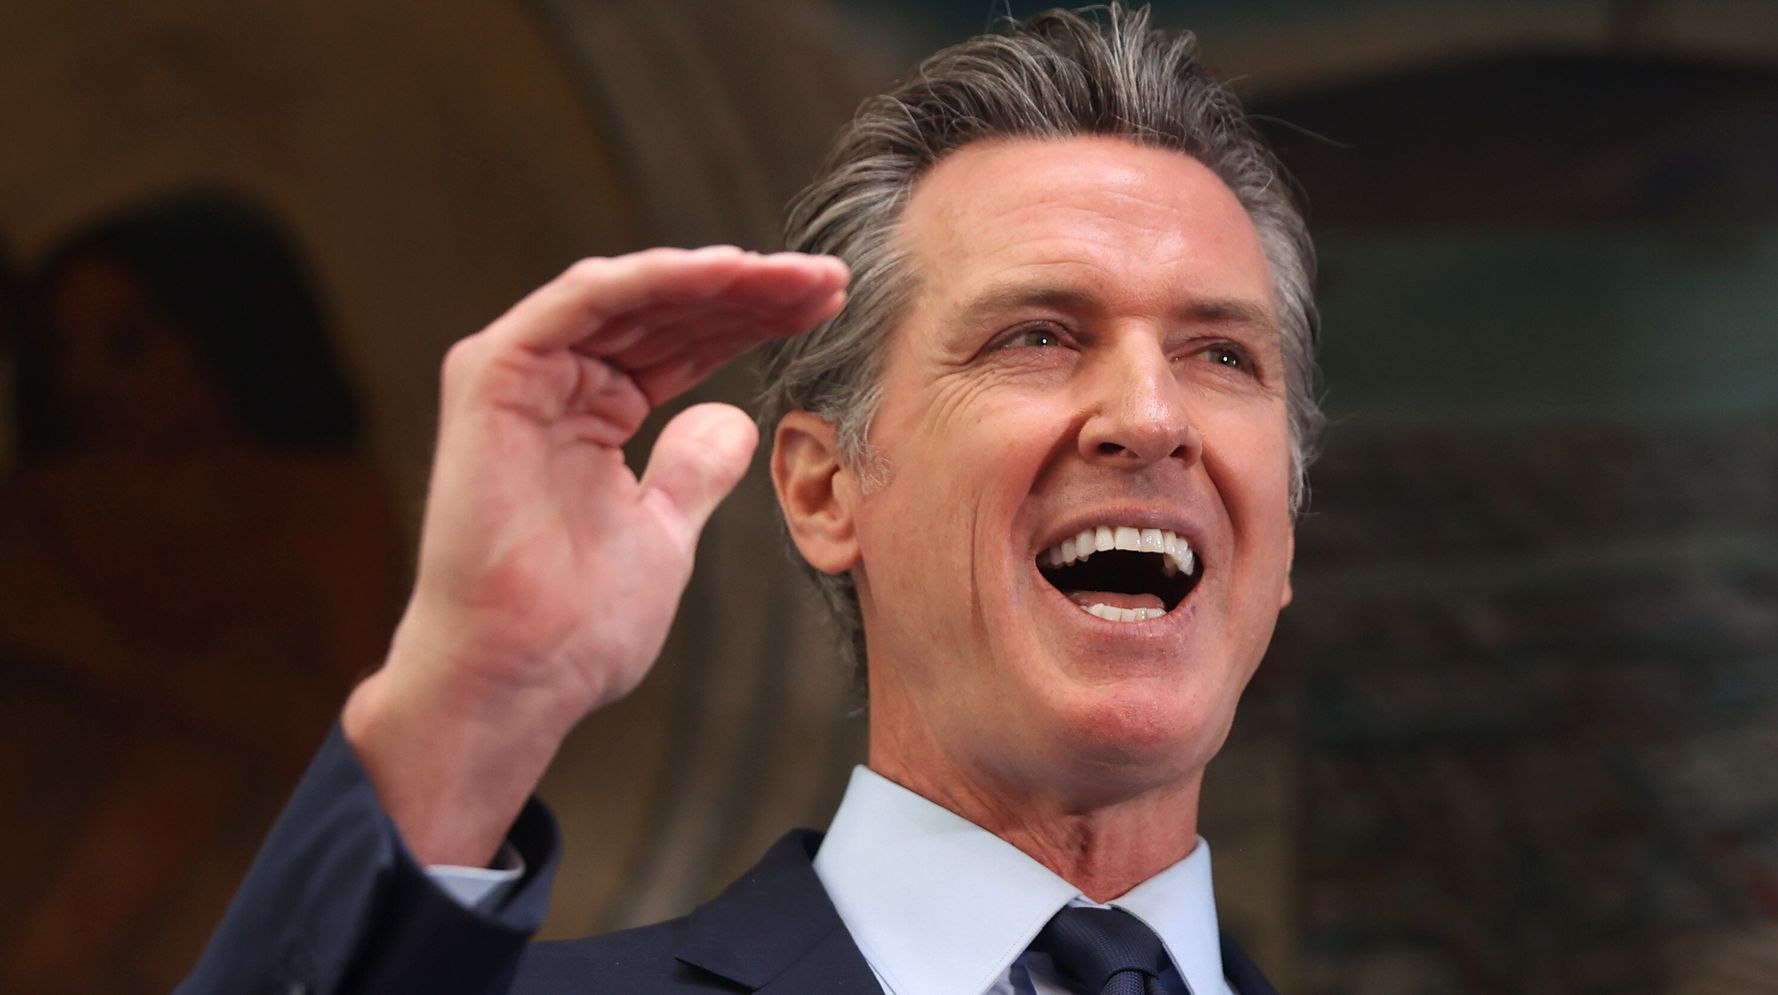 Californians Increasingly Against Recalling Gov. Newsom, Poll Finds